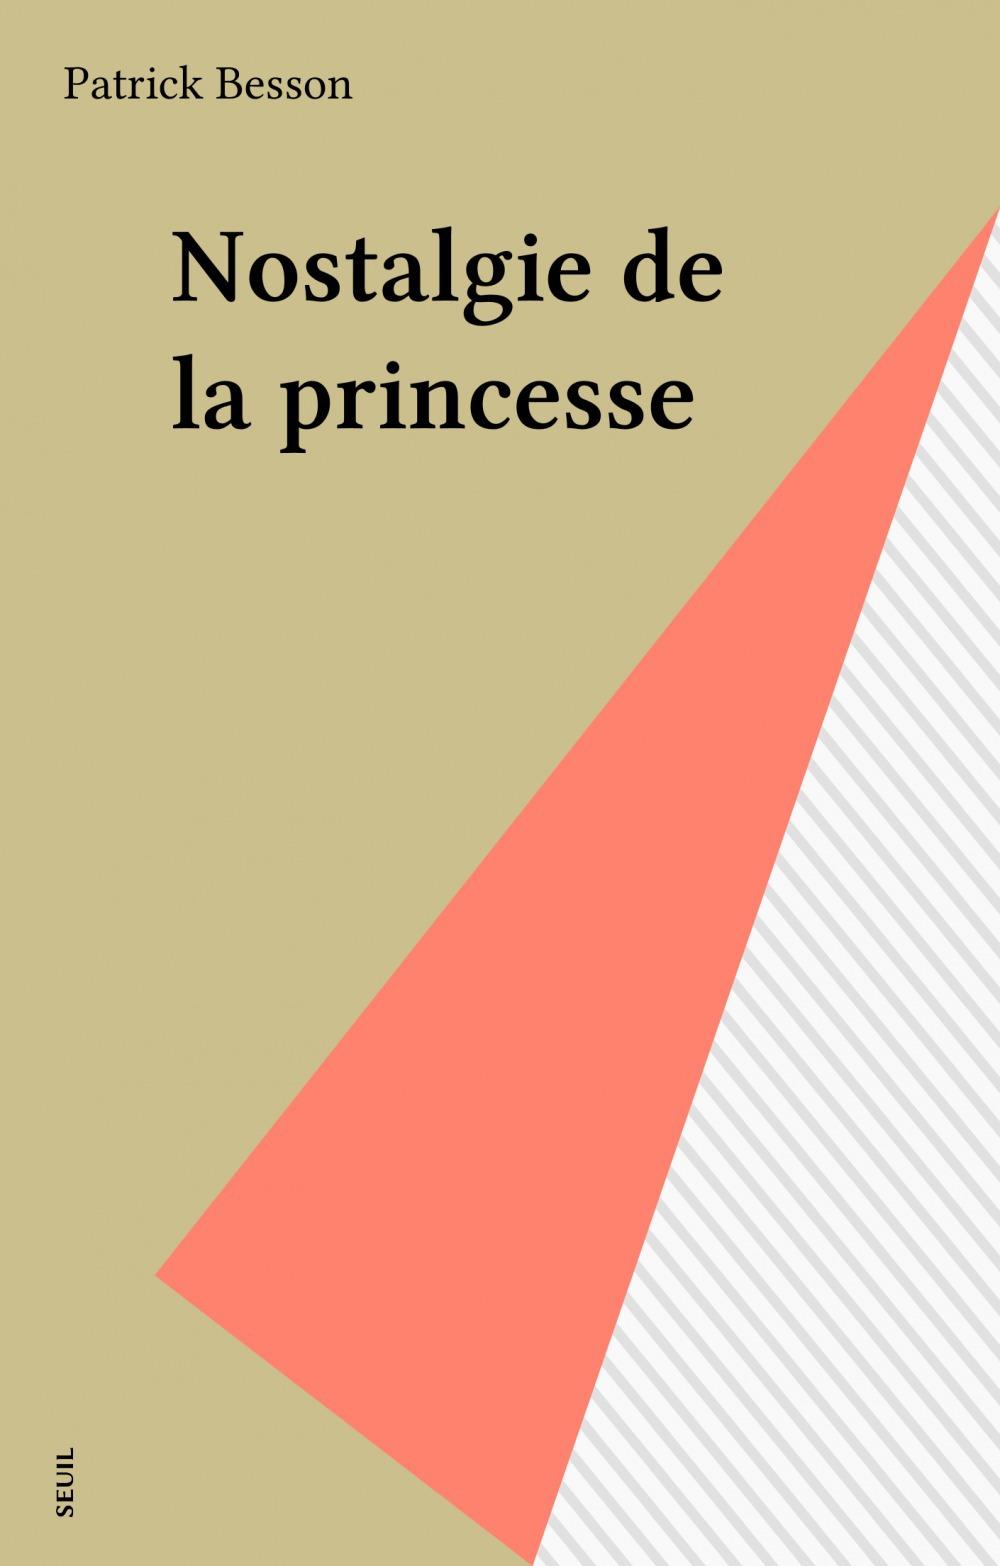 Nostalgie de la princesse  - Patrick Besson